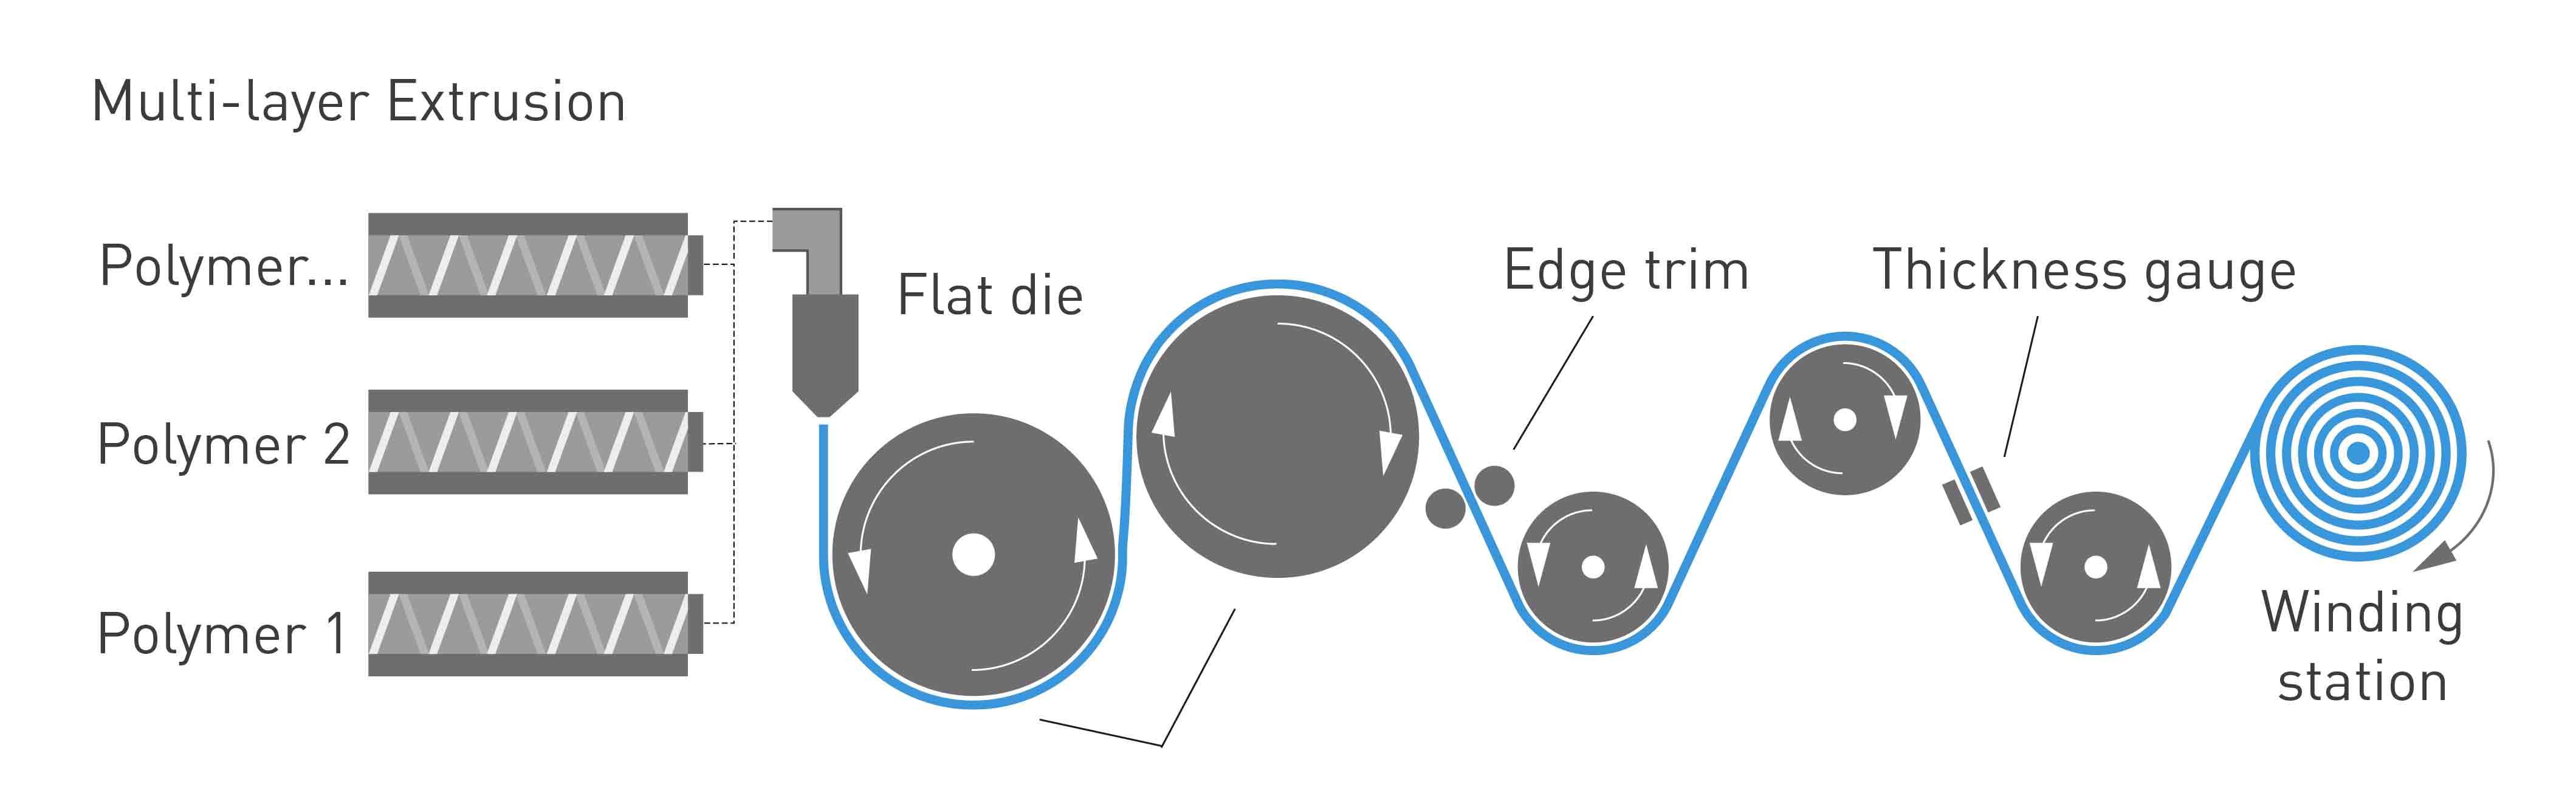 NUREL Engineering Polymers Cast Film Extrusion Process